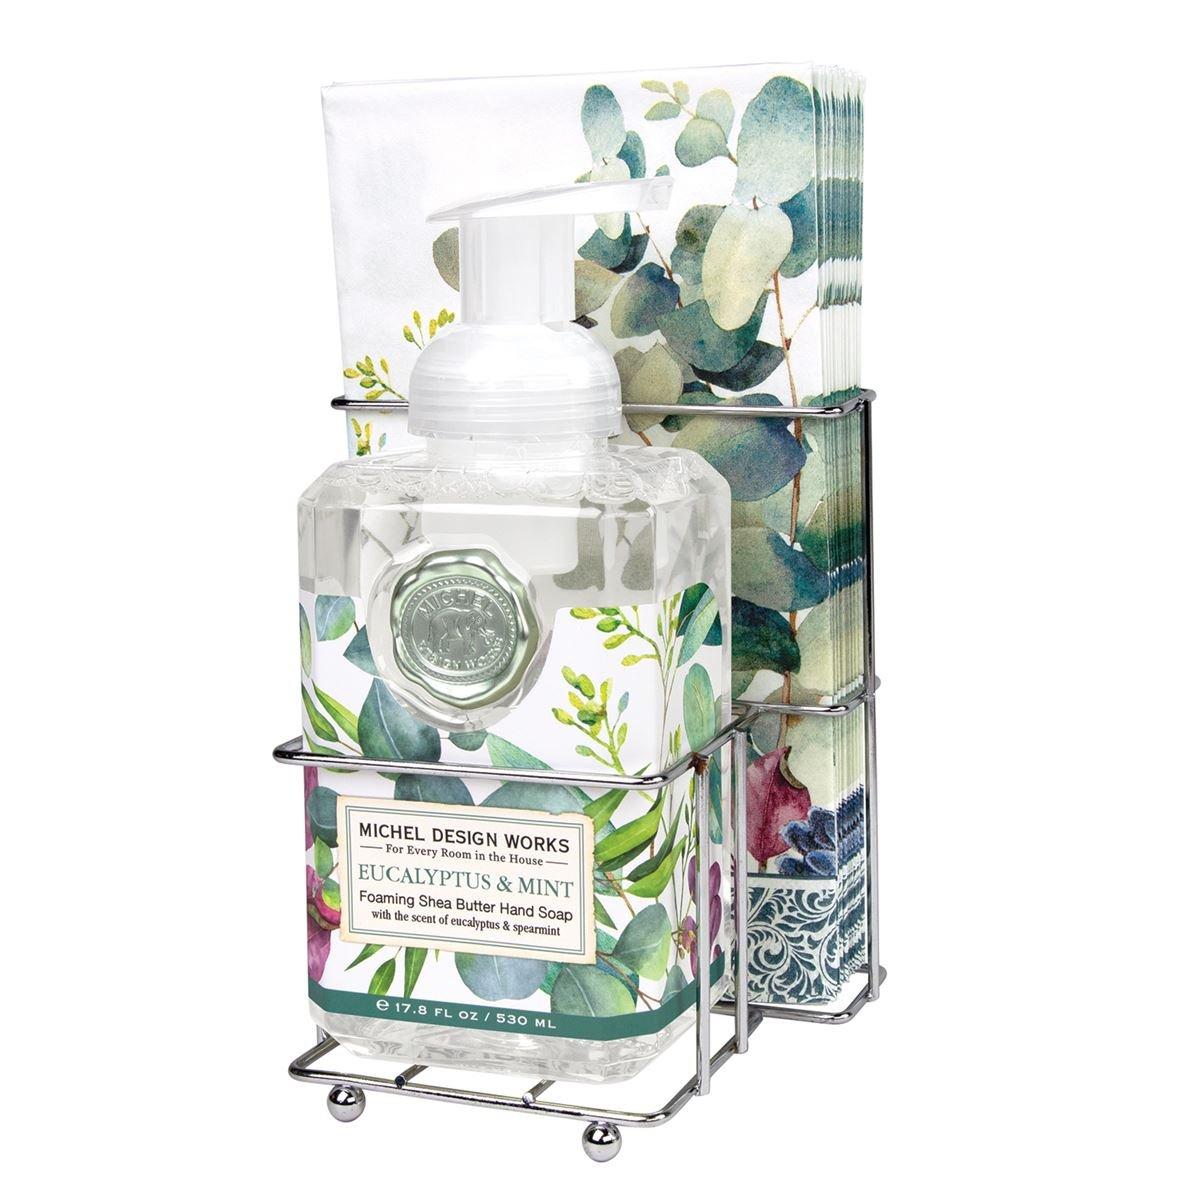 Eucalyptus & Mint Foaming Soap Napkin Set